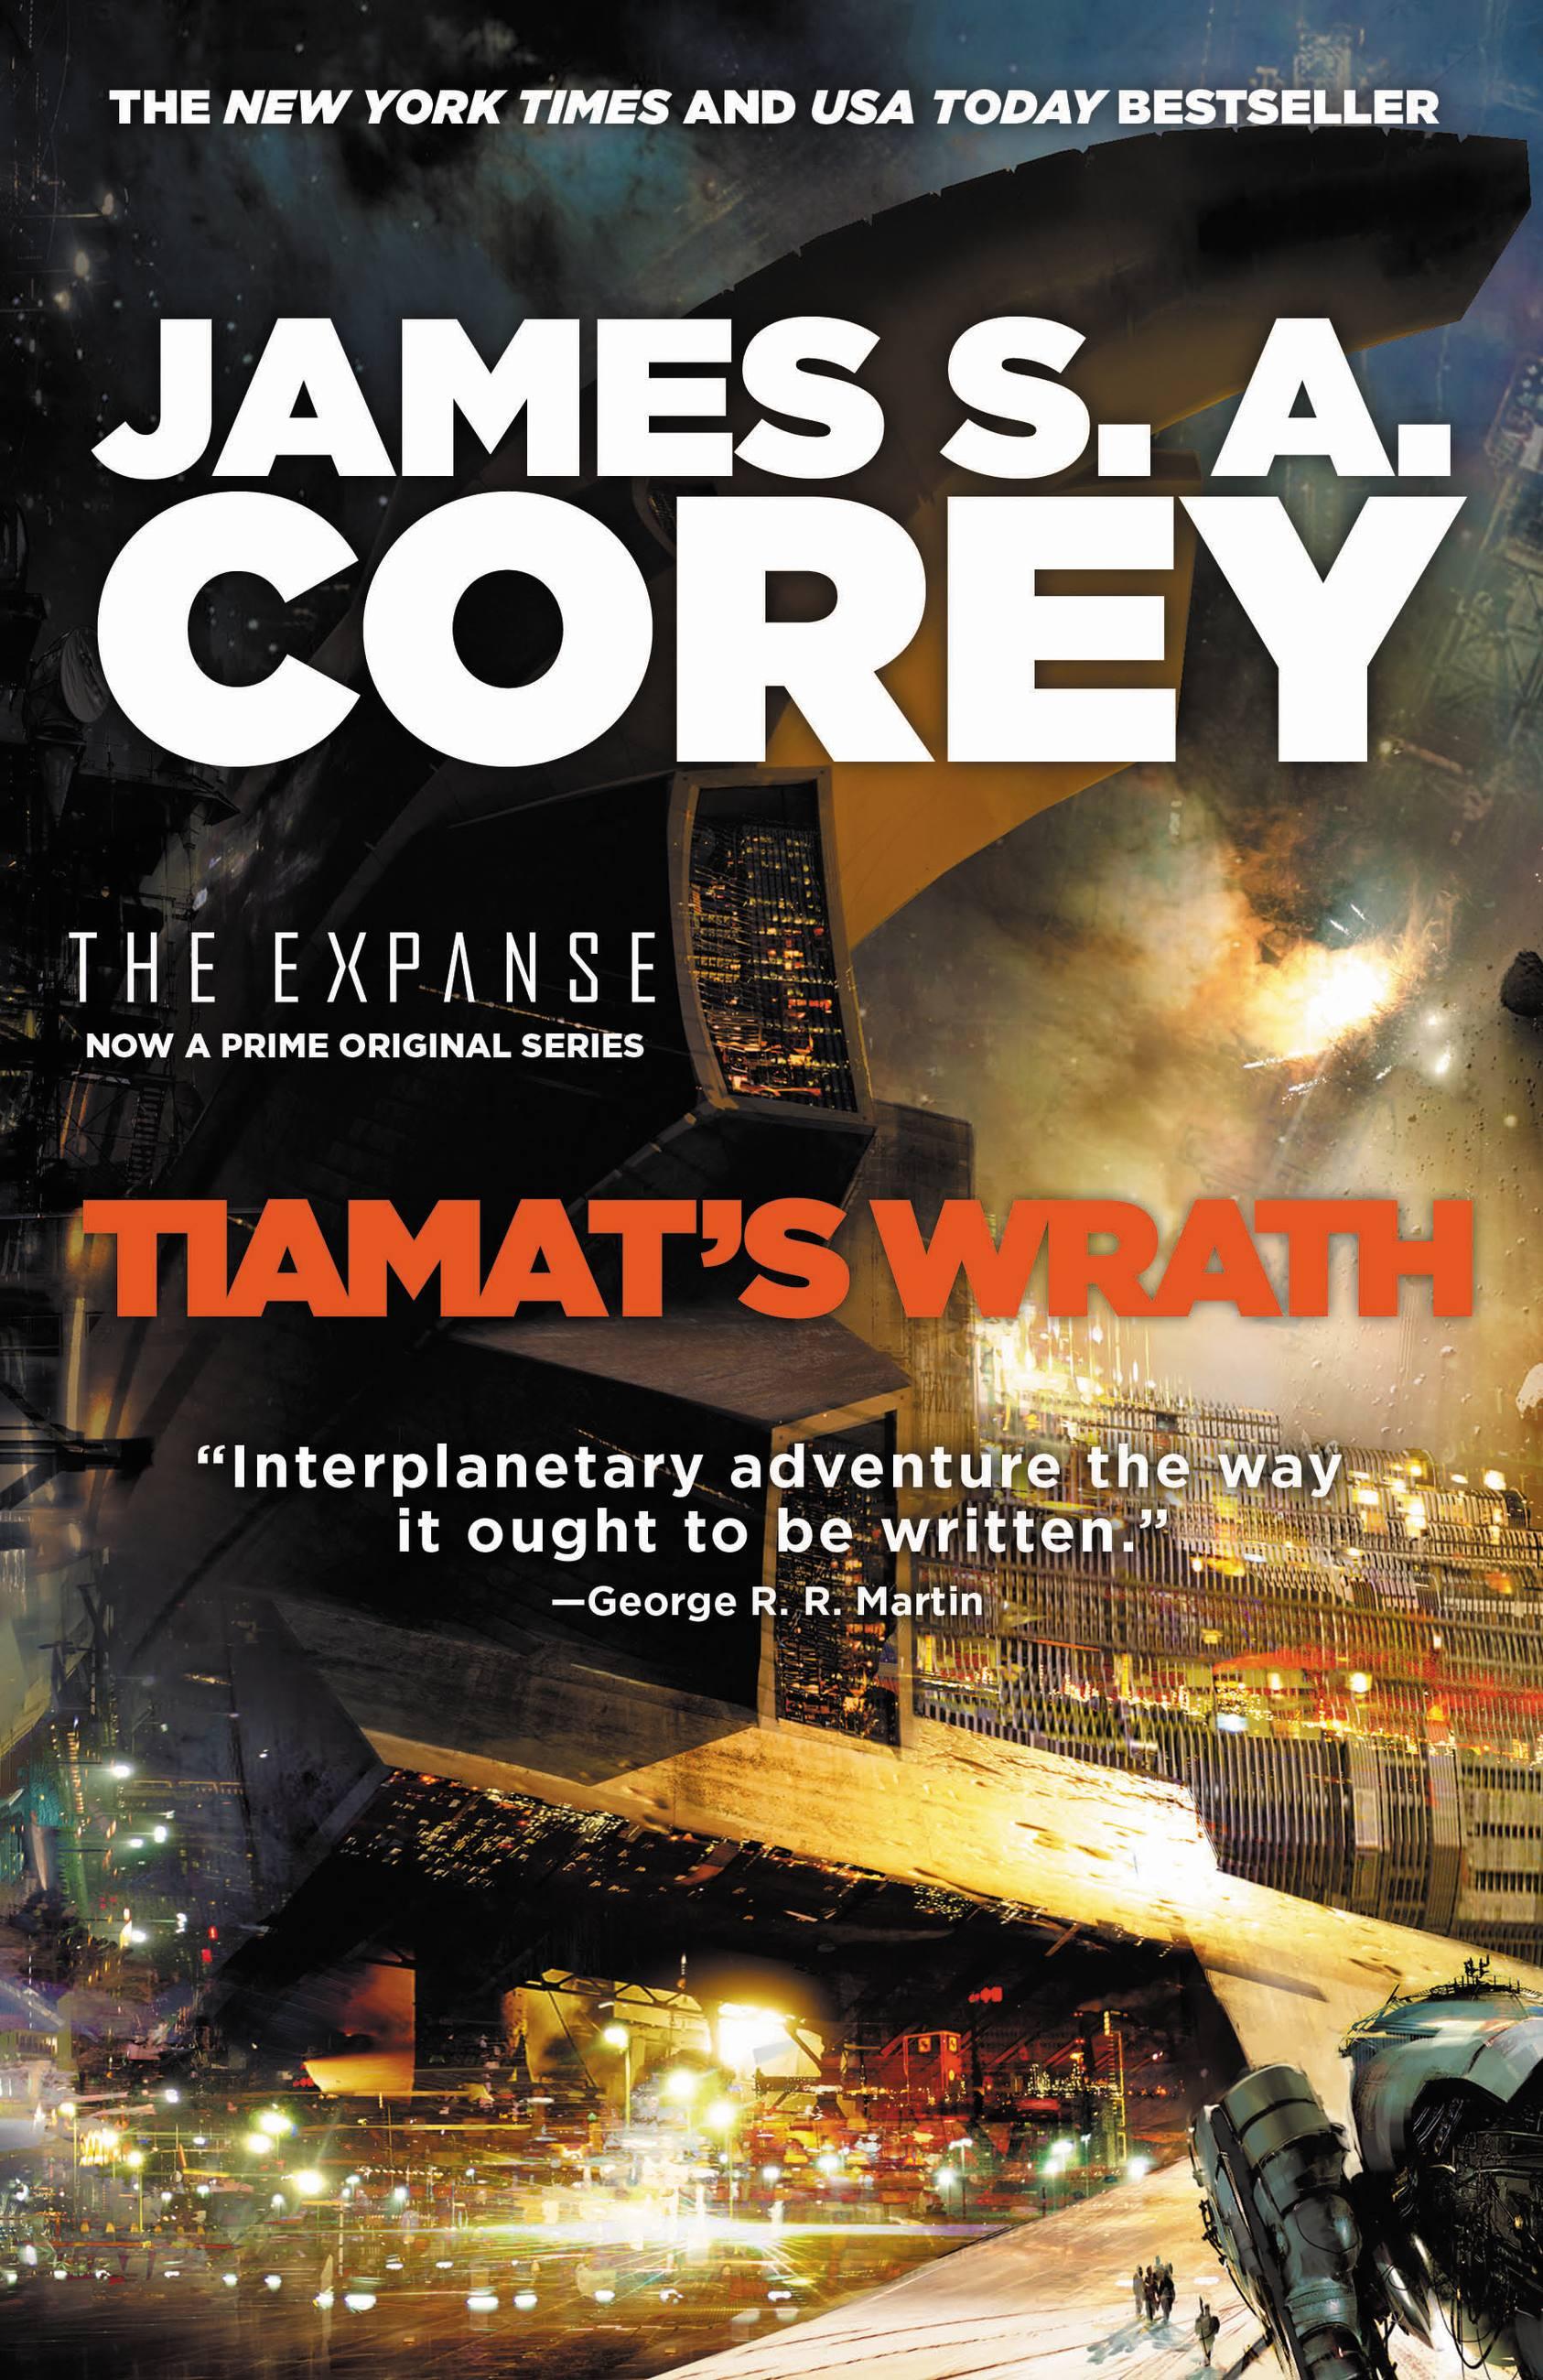 Cover Image of Tiamat's Wrath